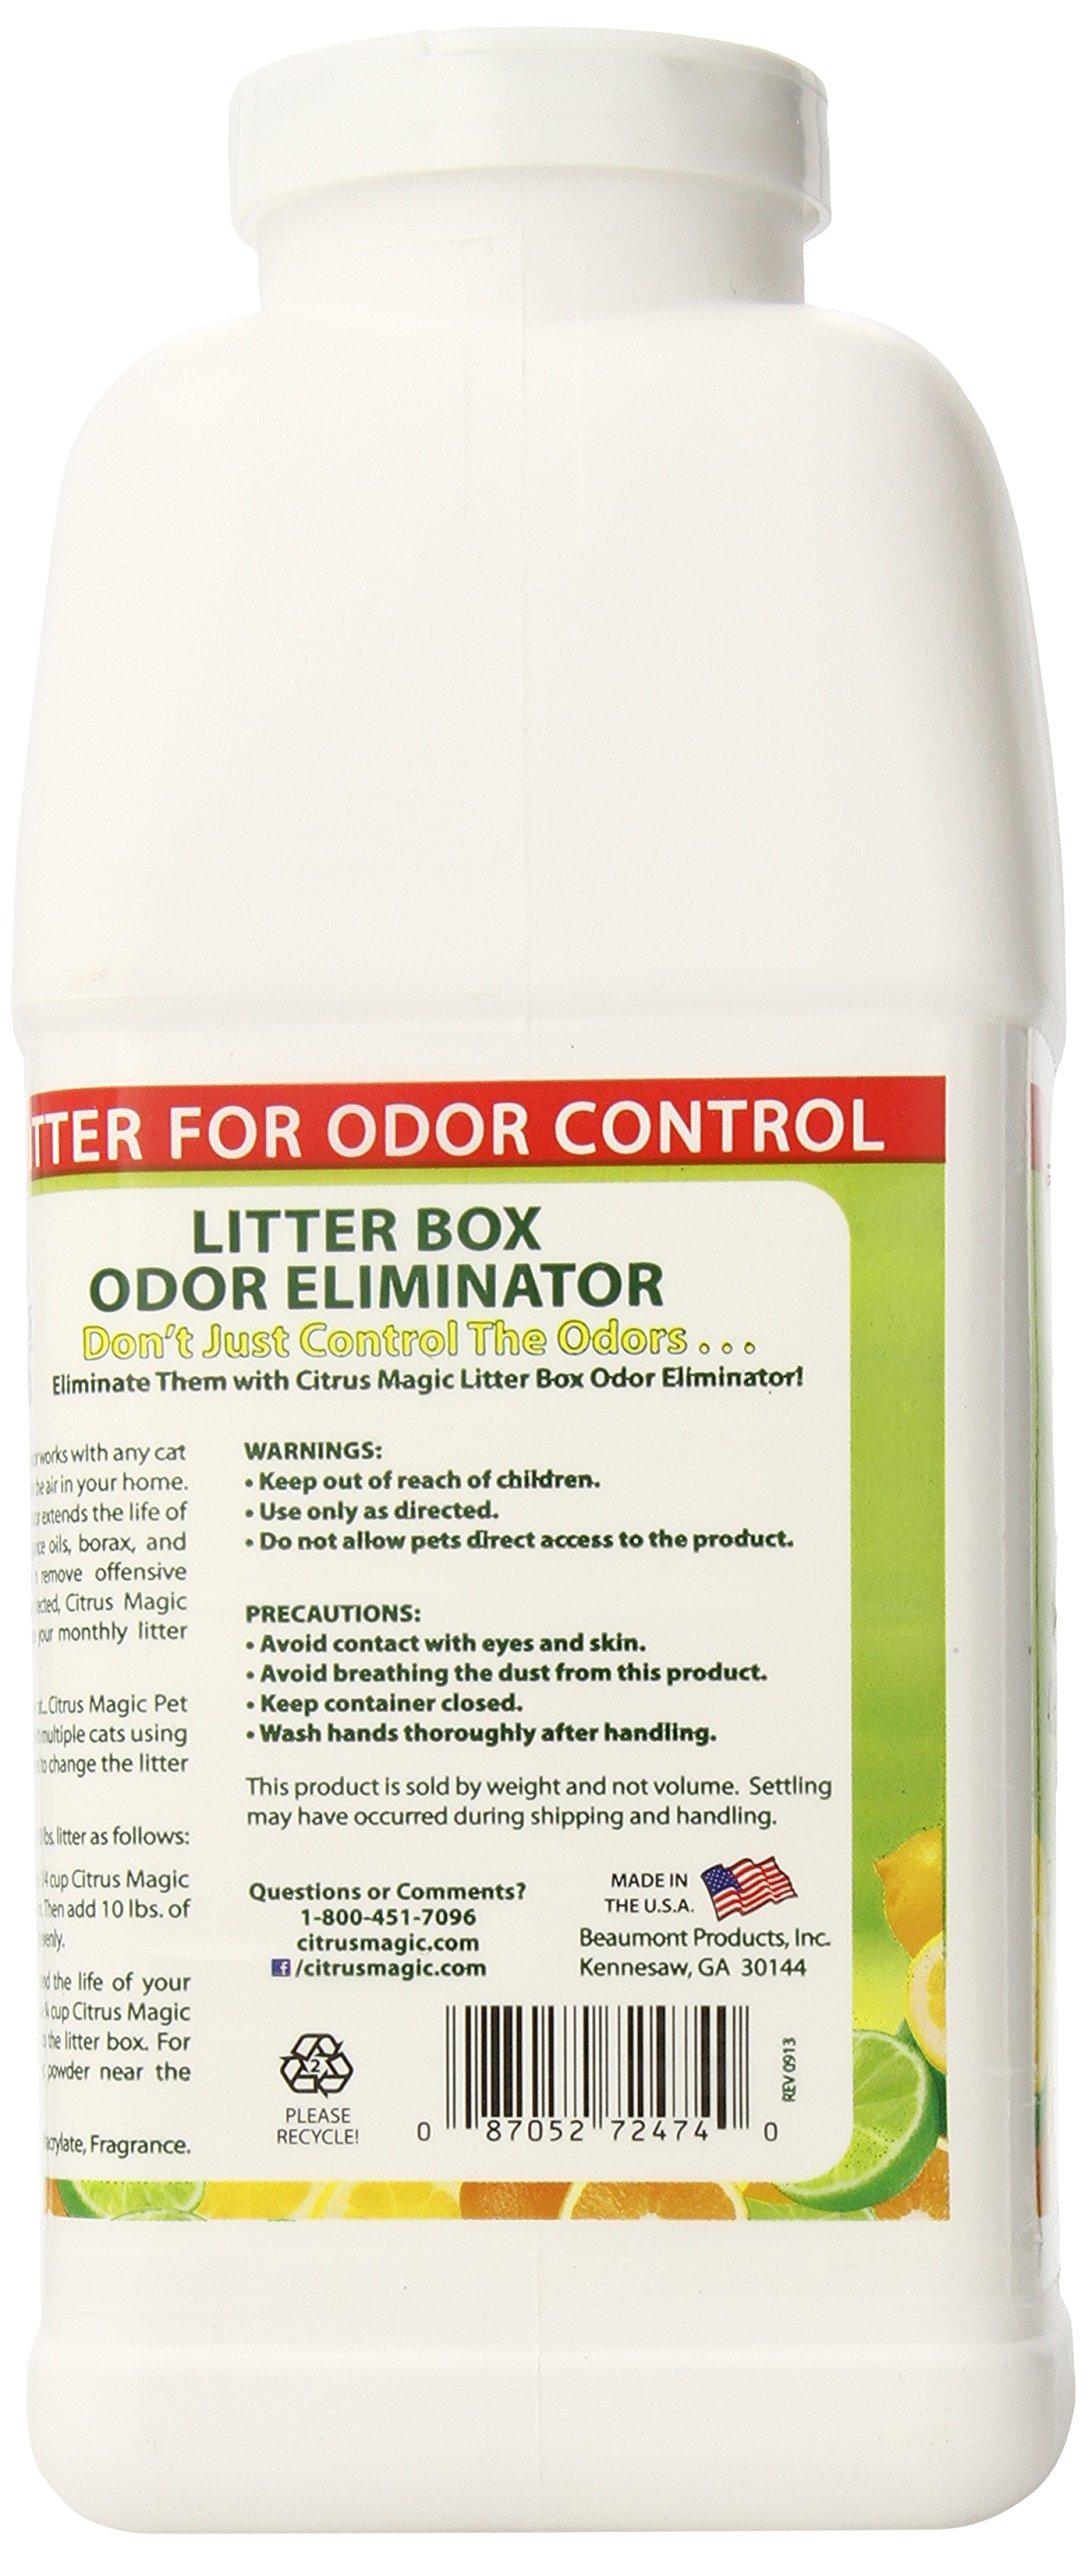 Citrus Magic Pet Litter Box Odor Eliminator Fresh Citrus, 40-Ounce by Citrus Magic (Image #2)